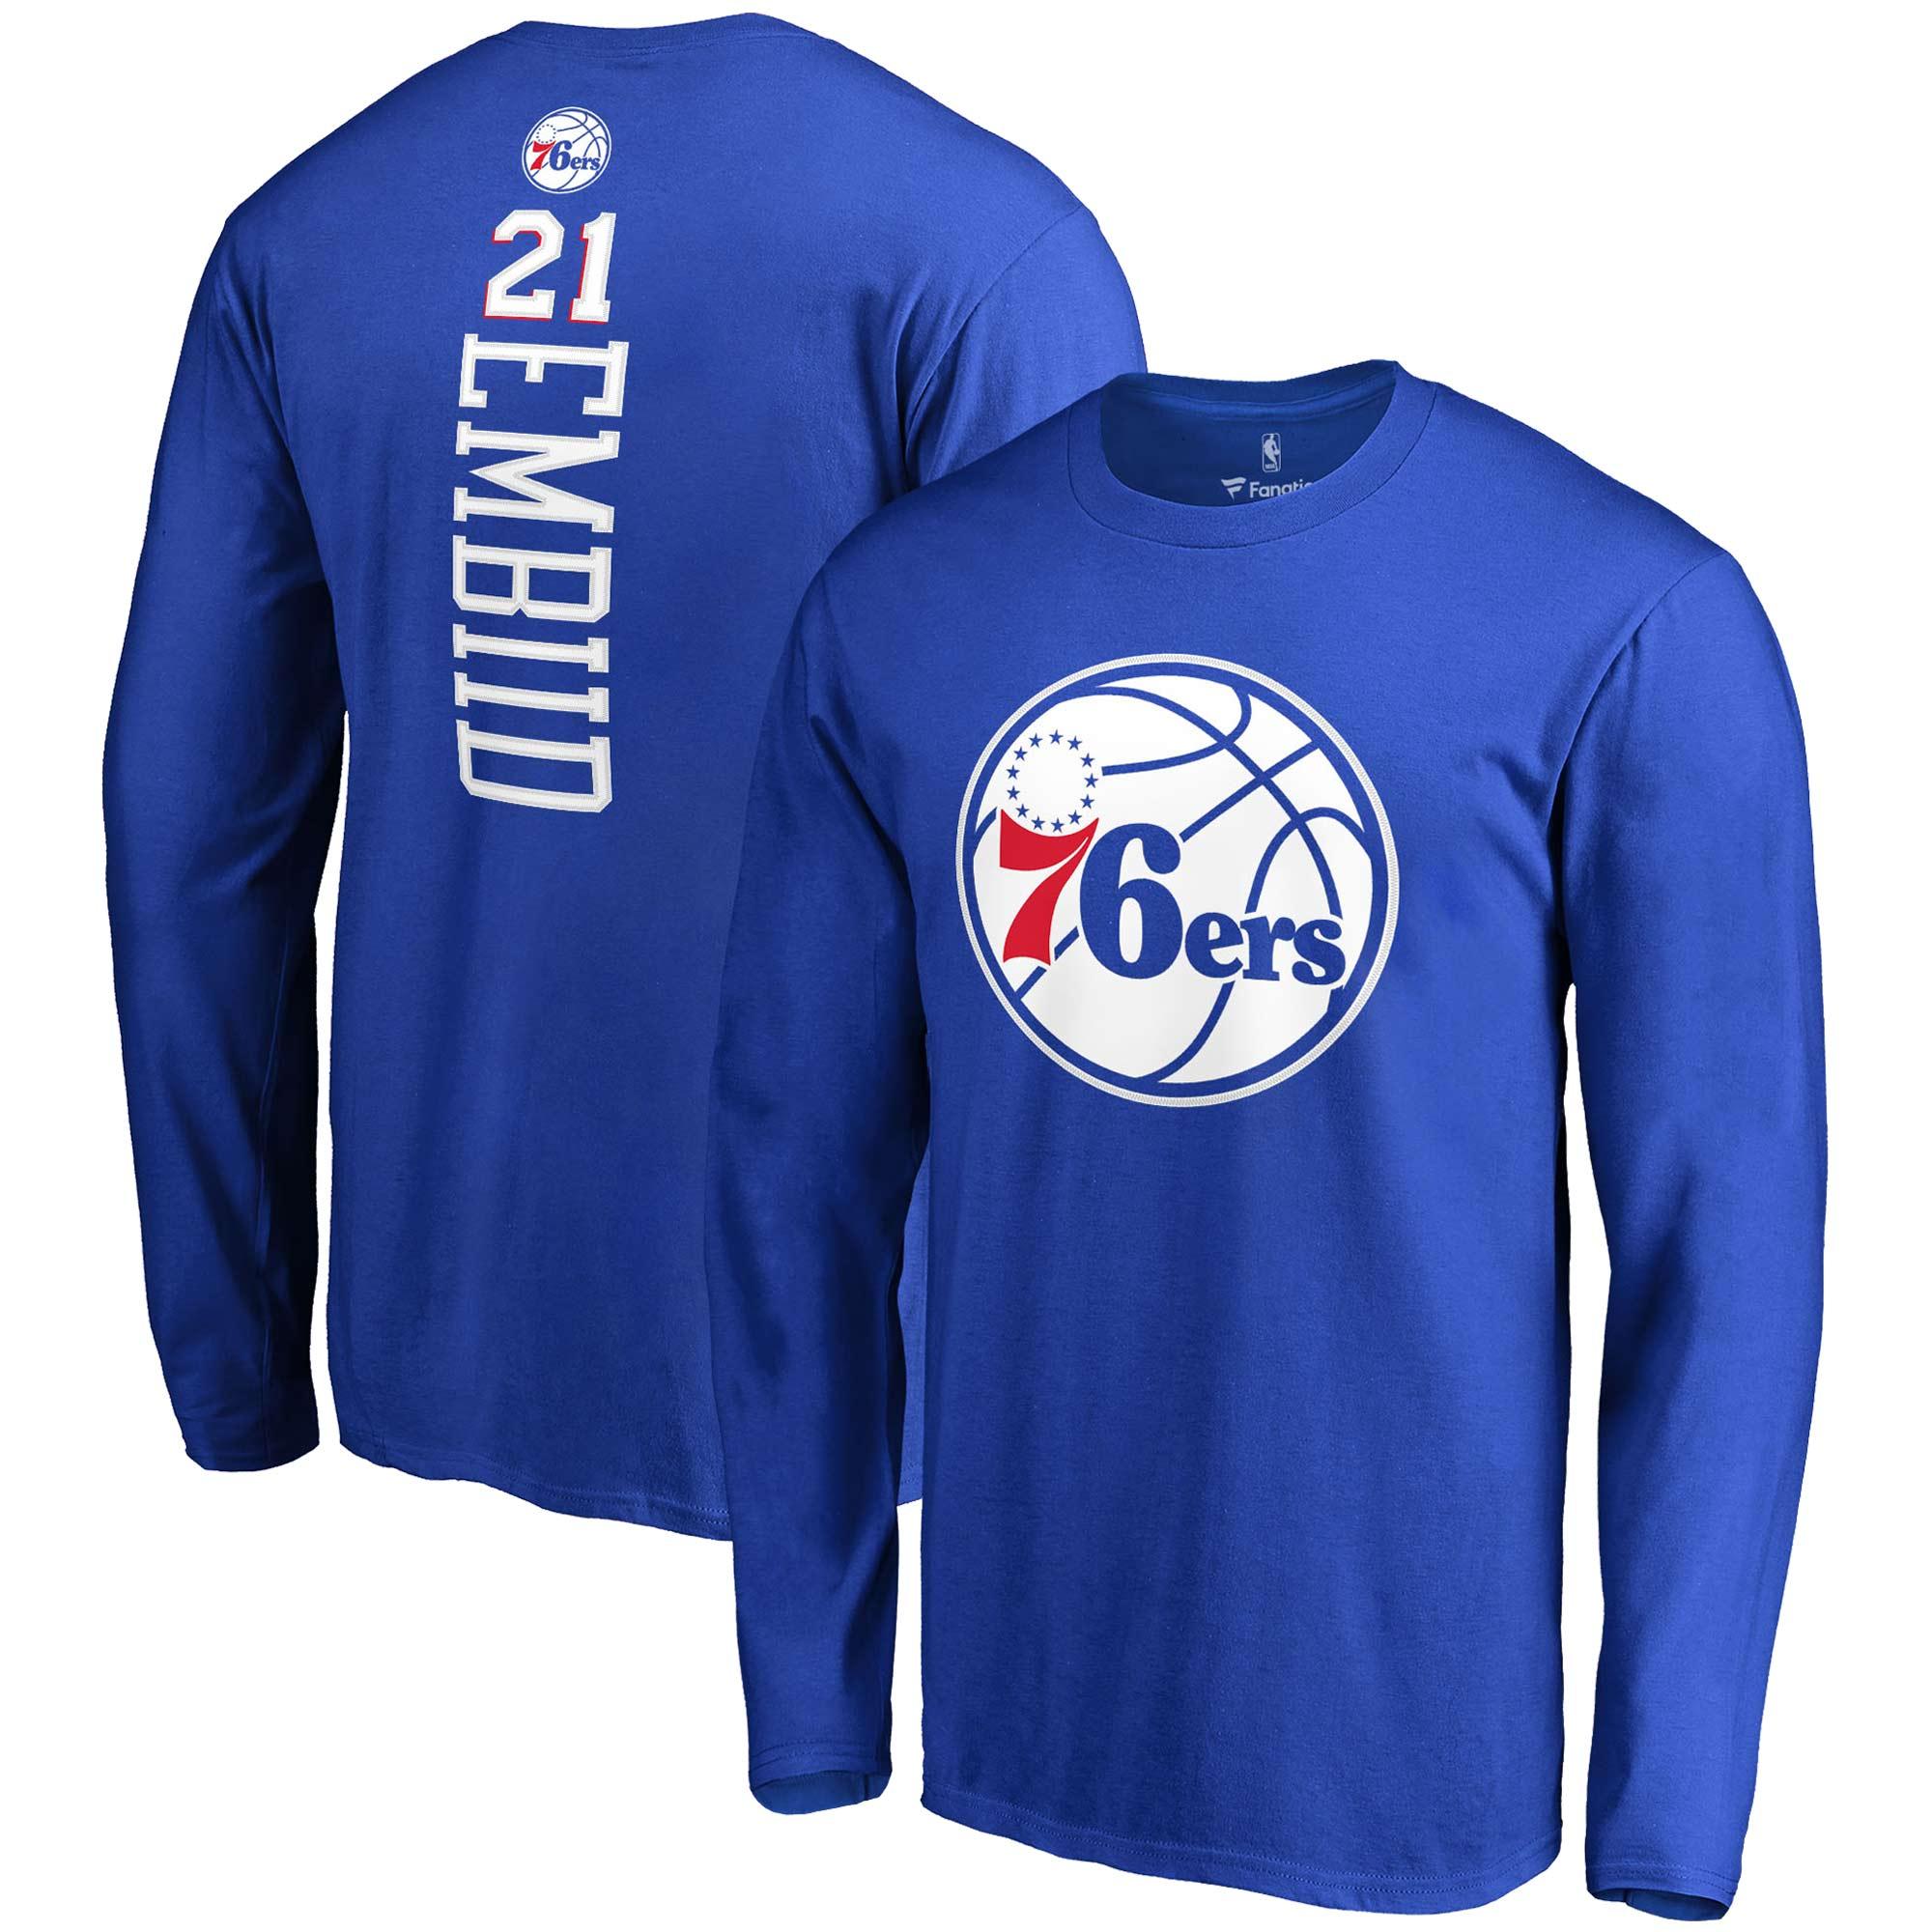 Joel Embiid Philadelphia 76ers Fanatics Branded Backer Name & Number Long Sleeve T-Shirt - Royal